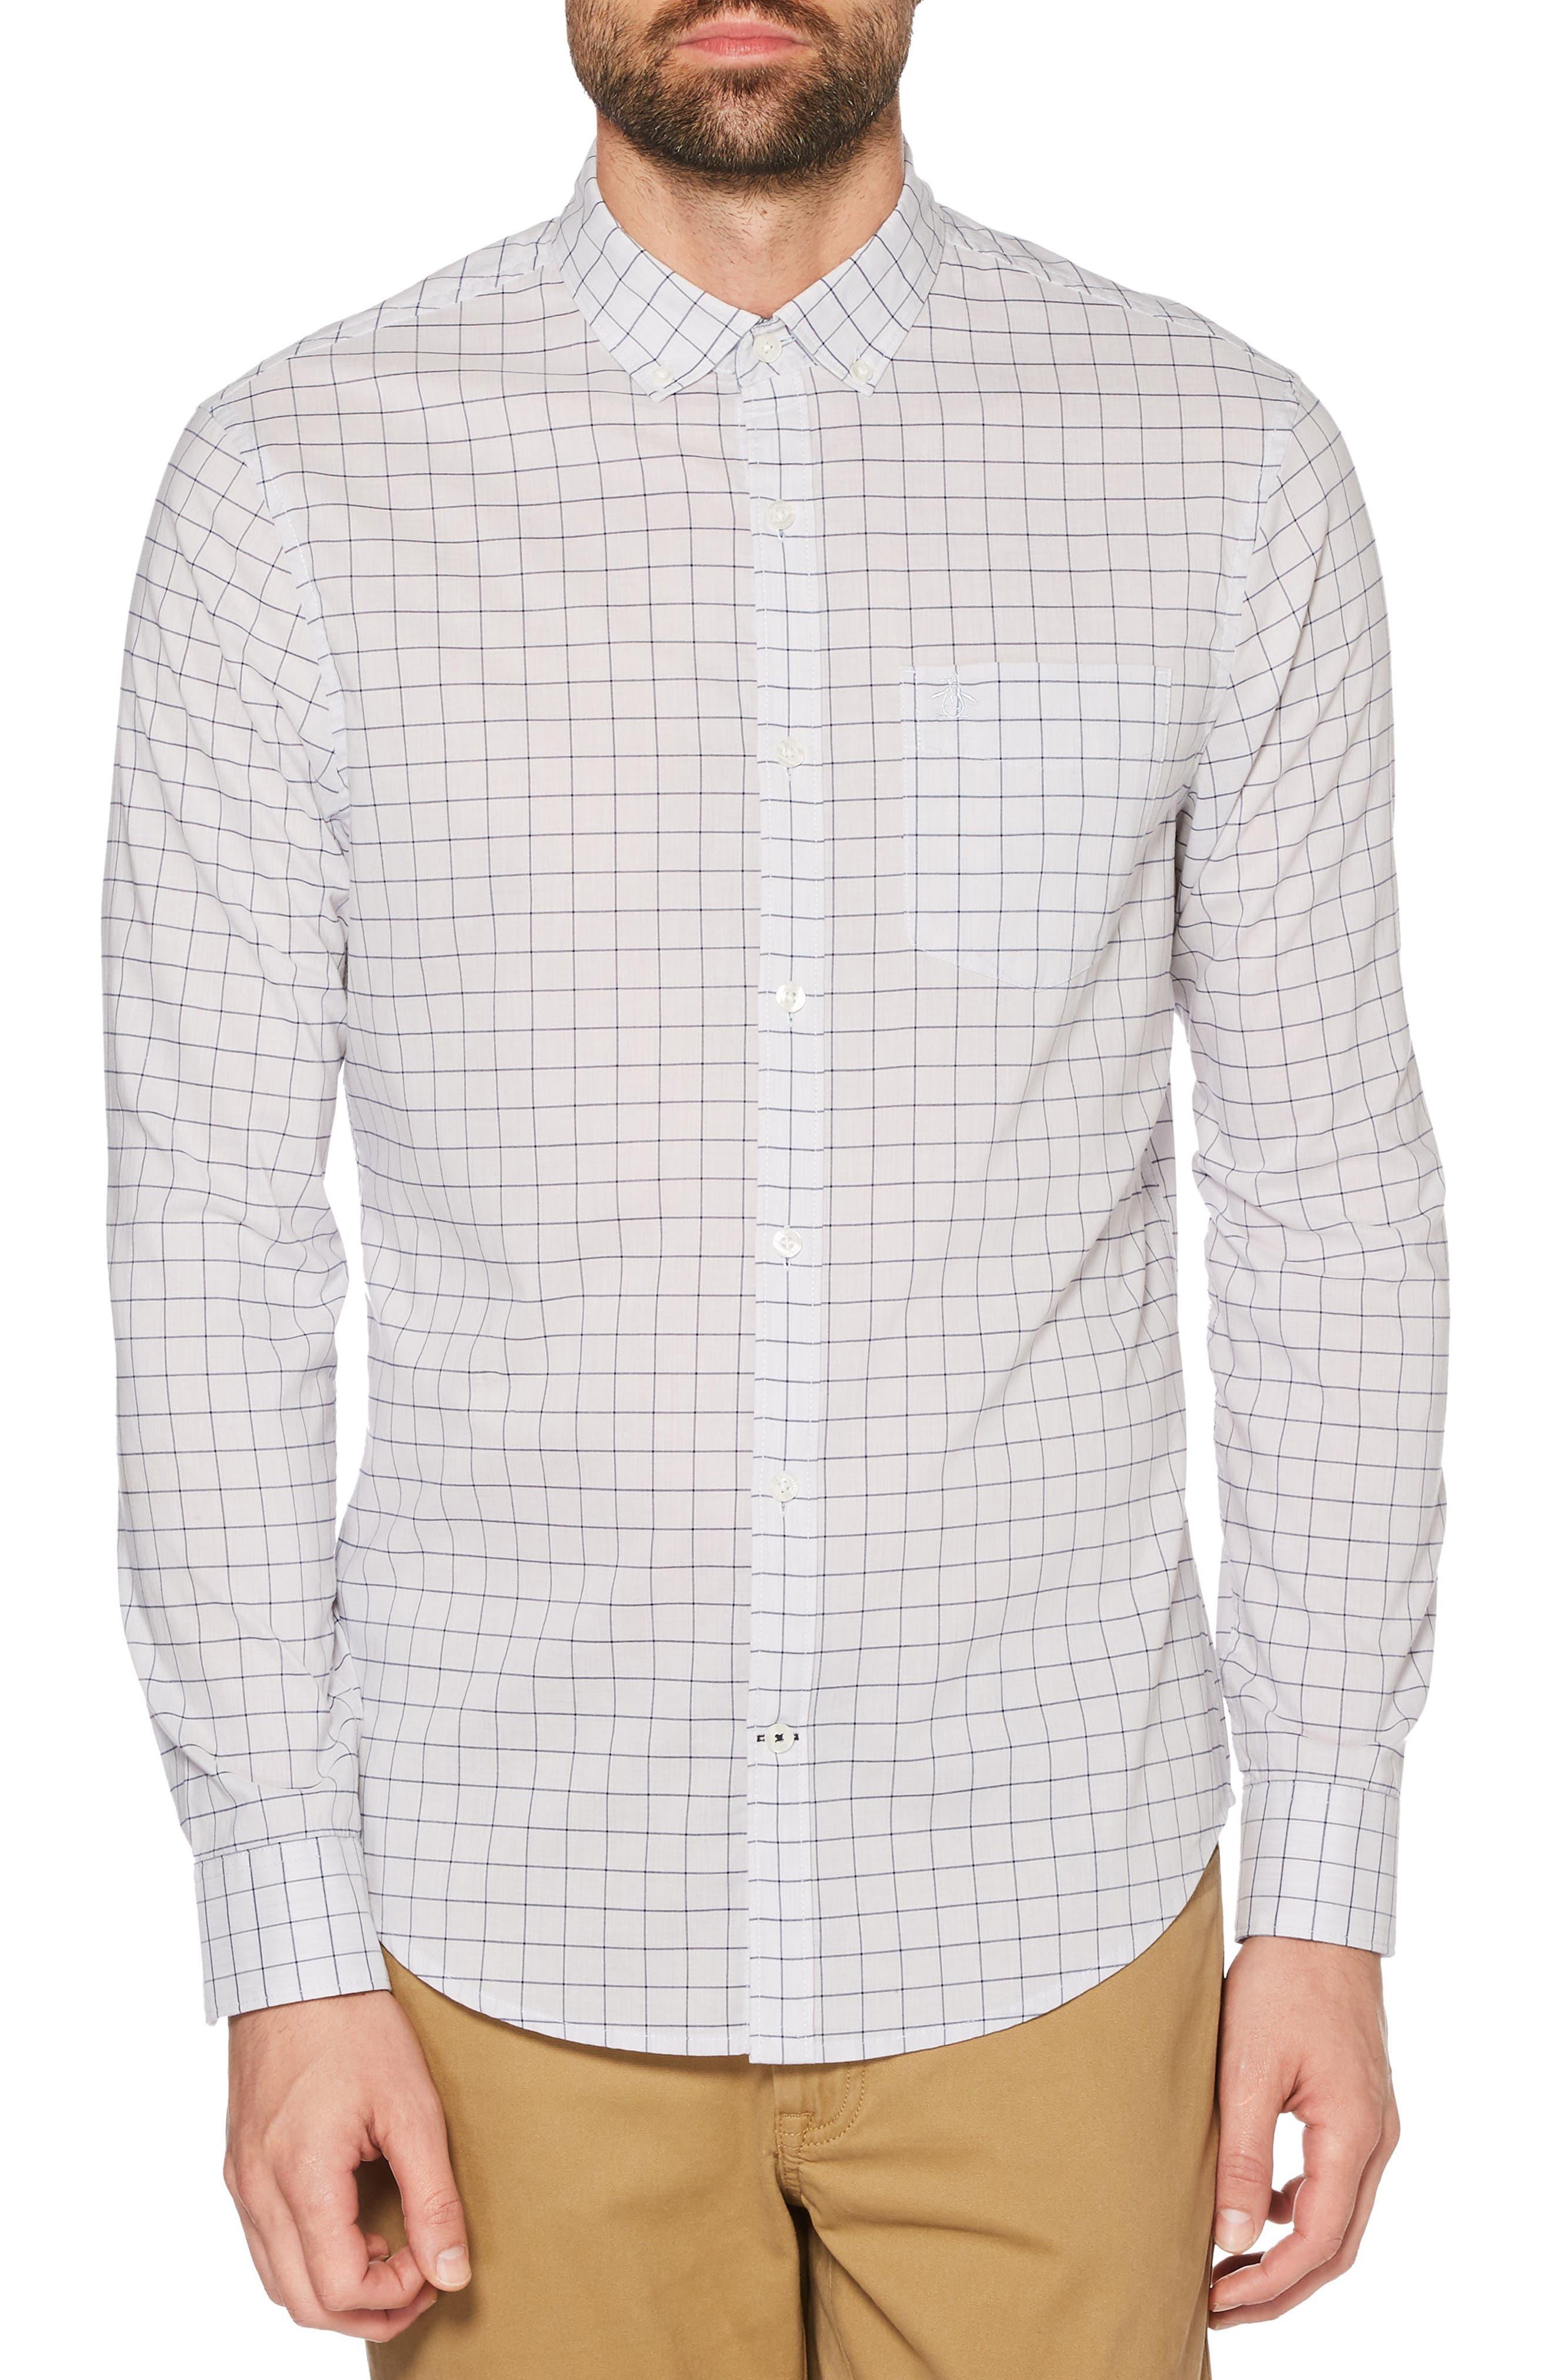 P55 Slim Fit Shirt,                             Main thumbnail 1, color,                             427